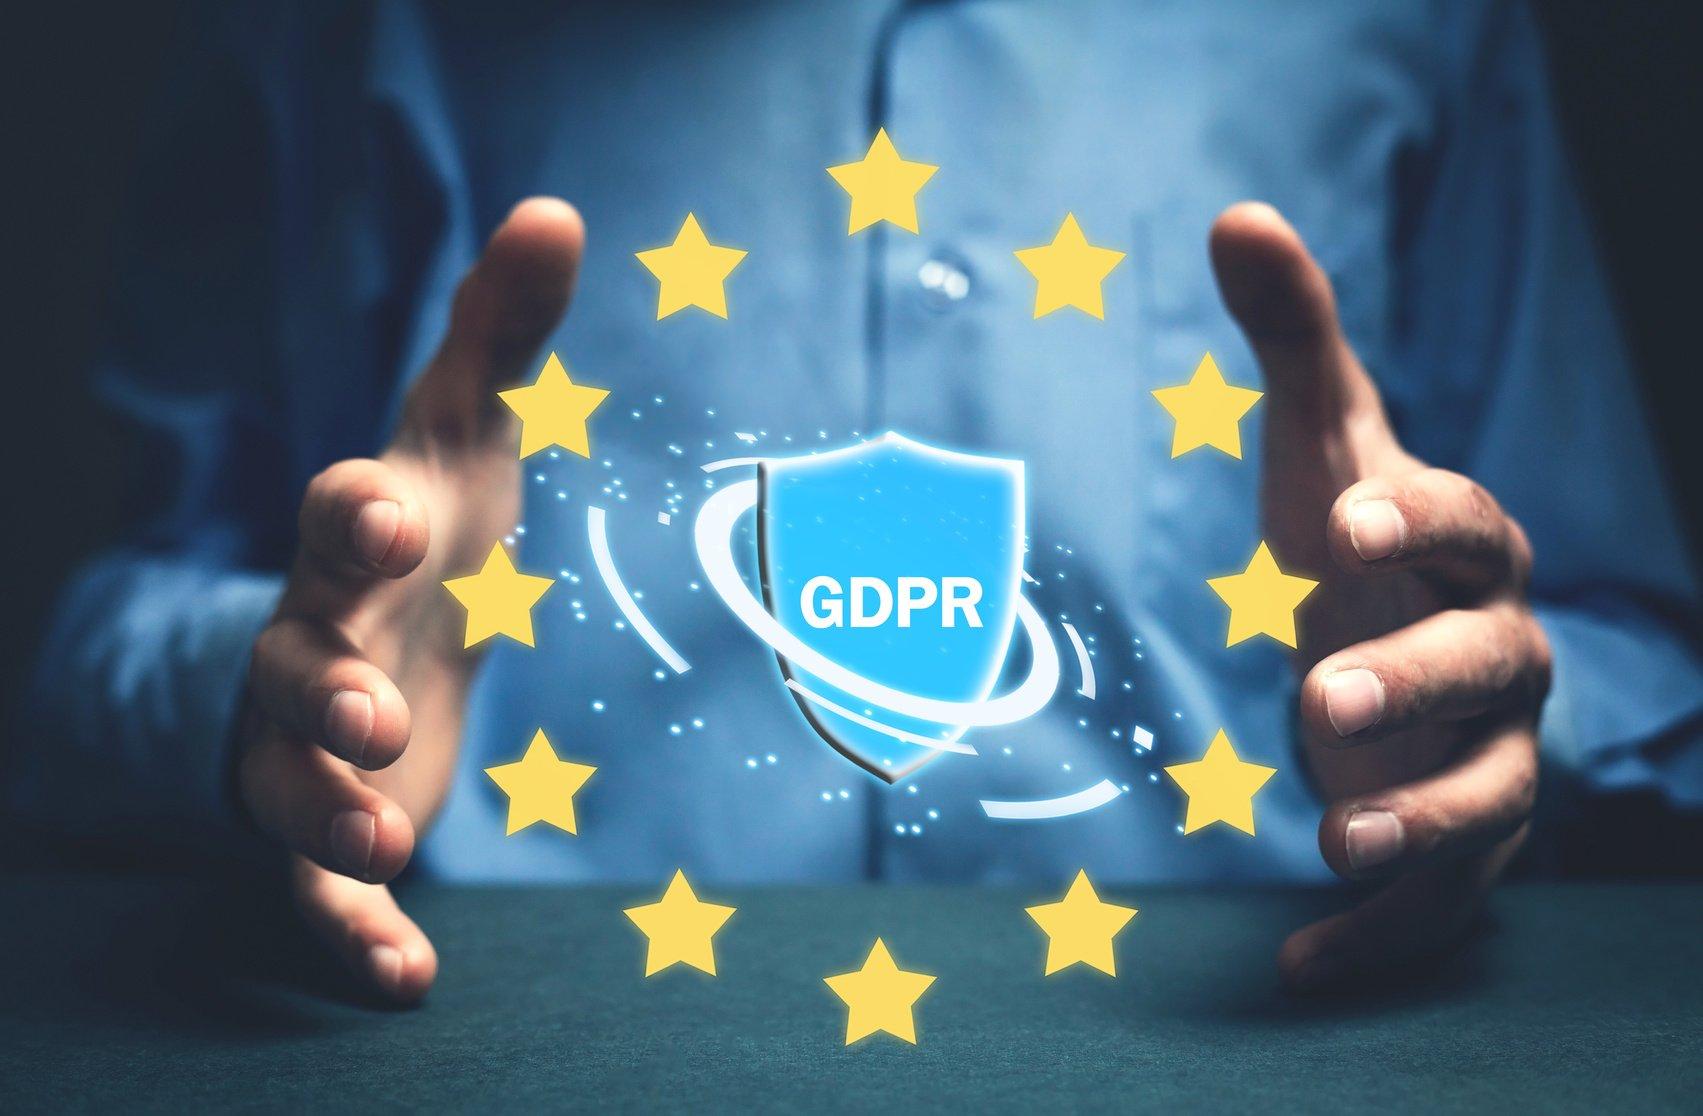 ad95d33f260 Ευρωπαϊκή Επιτροπή: Ο γενικός κανονισμός για την προστασία δεδομένων ...